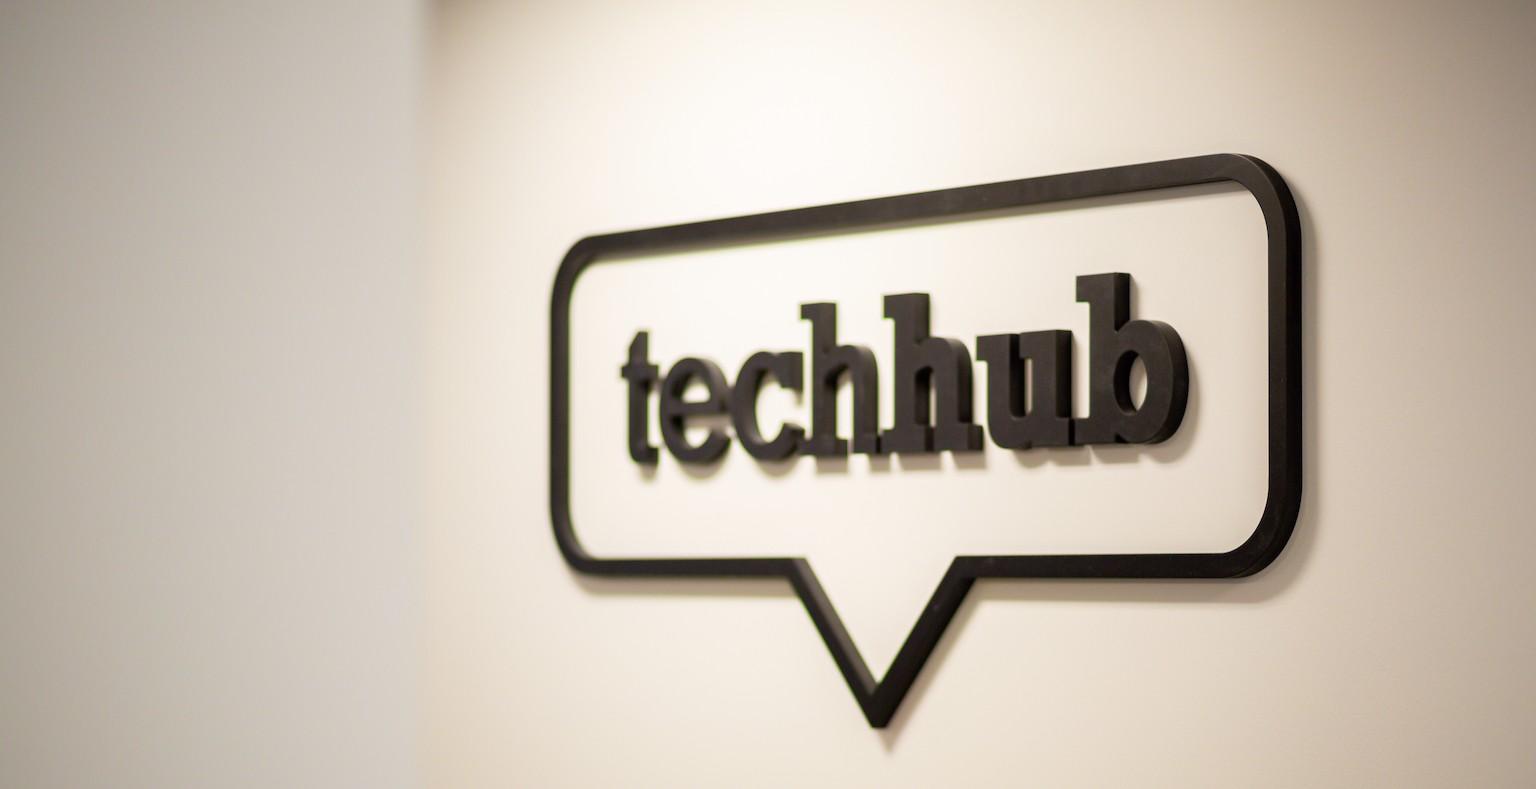 Tech Hub - Investors King